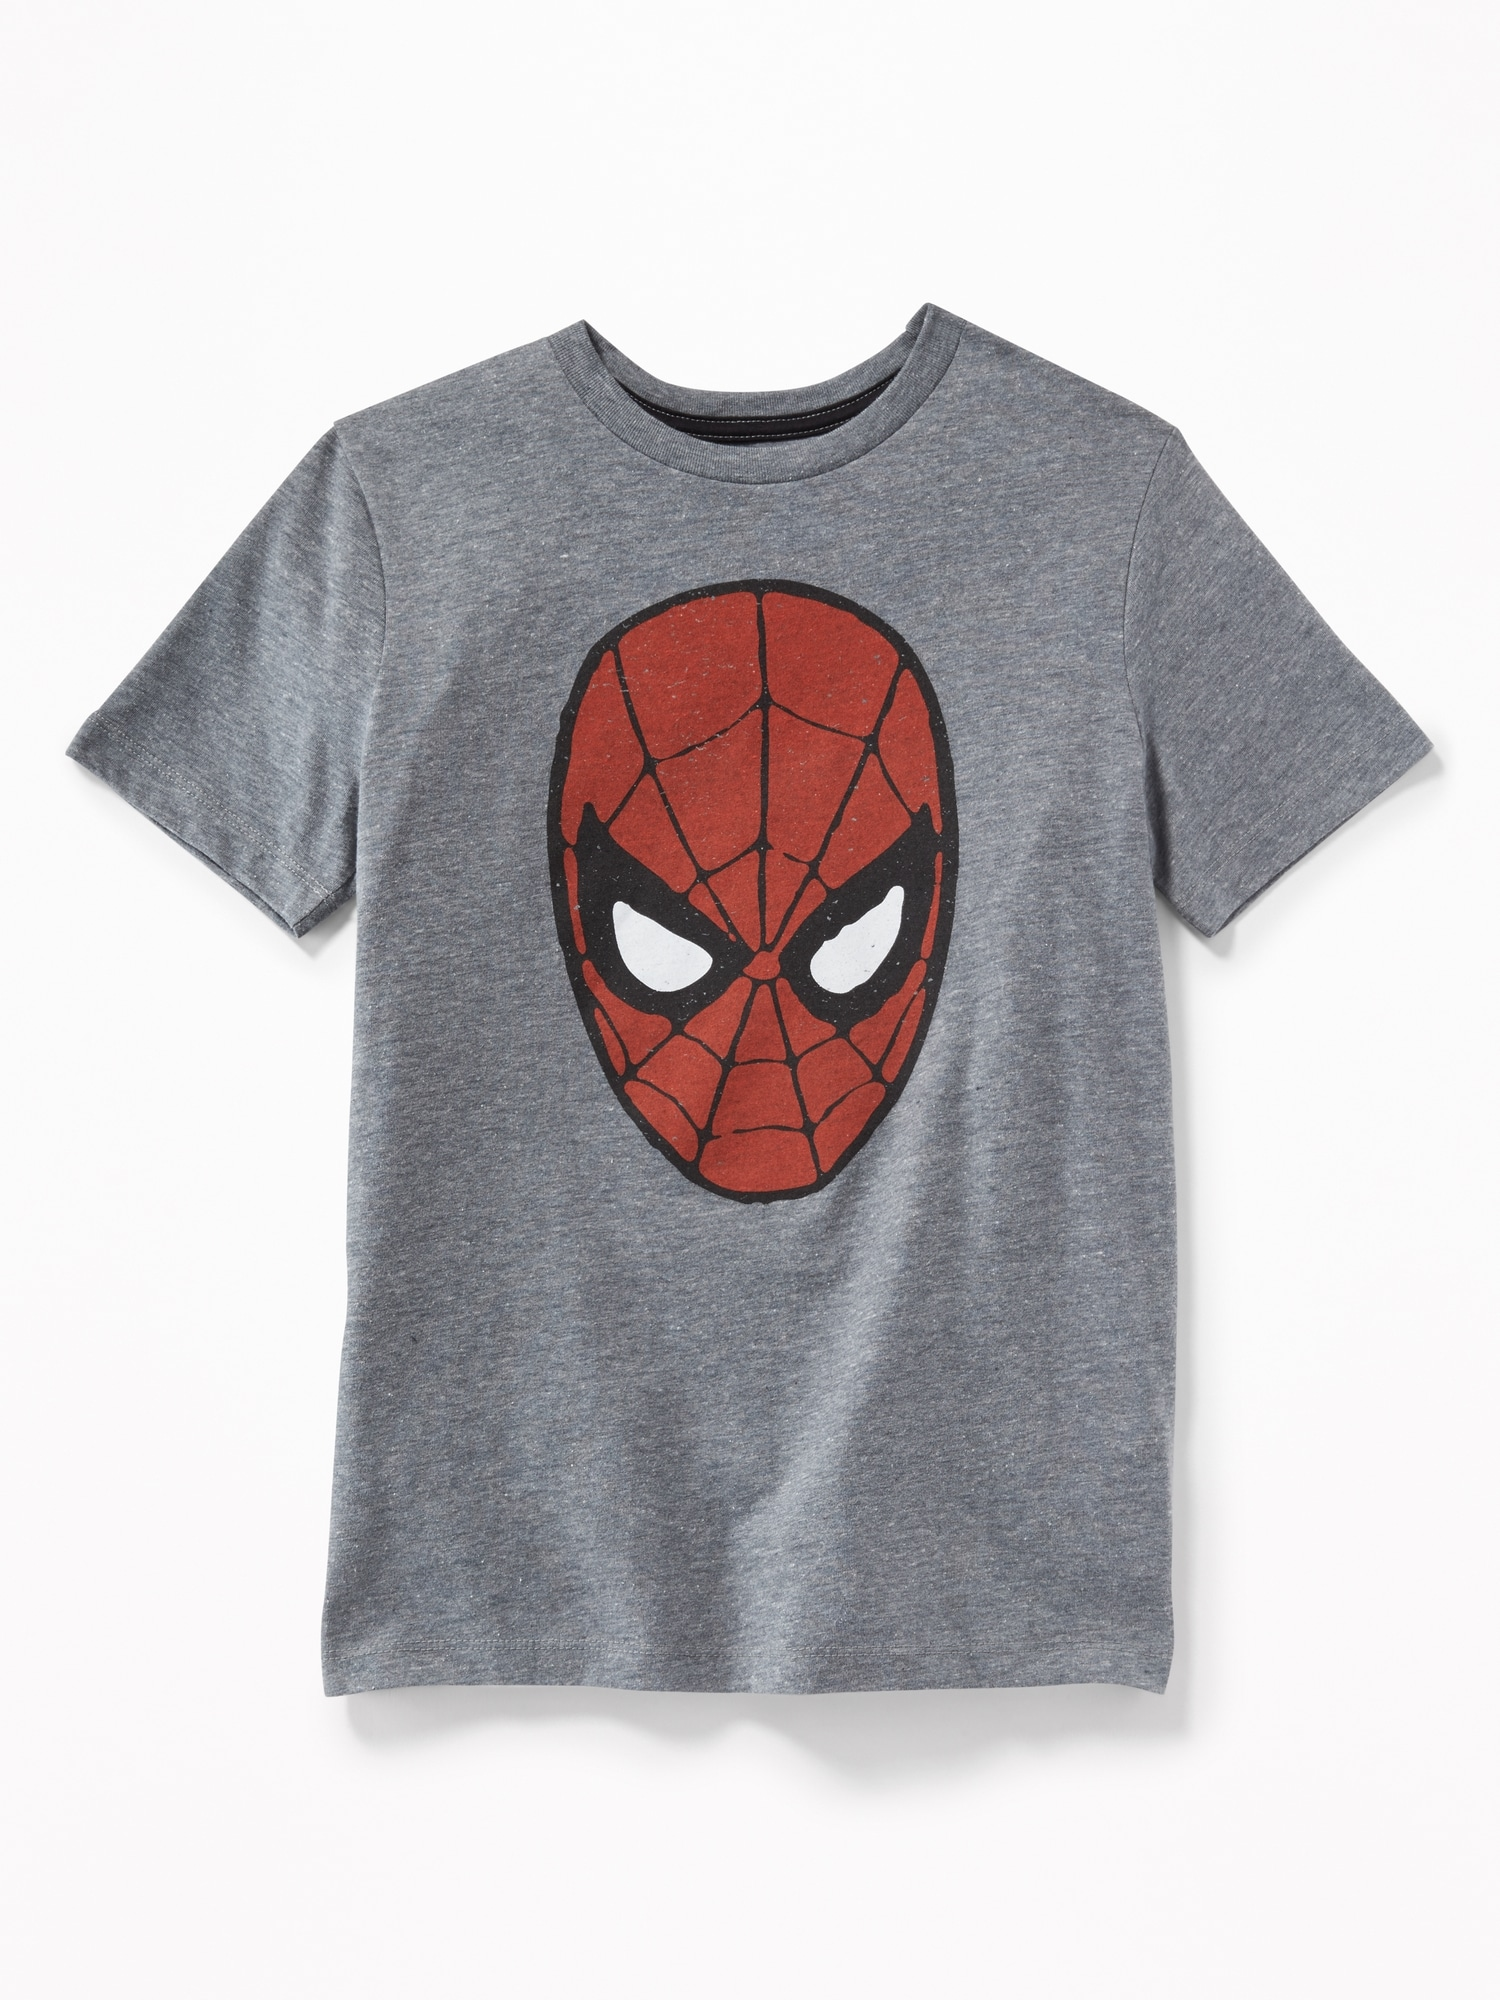 Tee Shirt Homme Gap Marvel